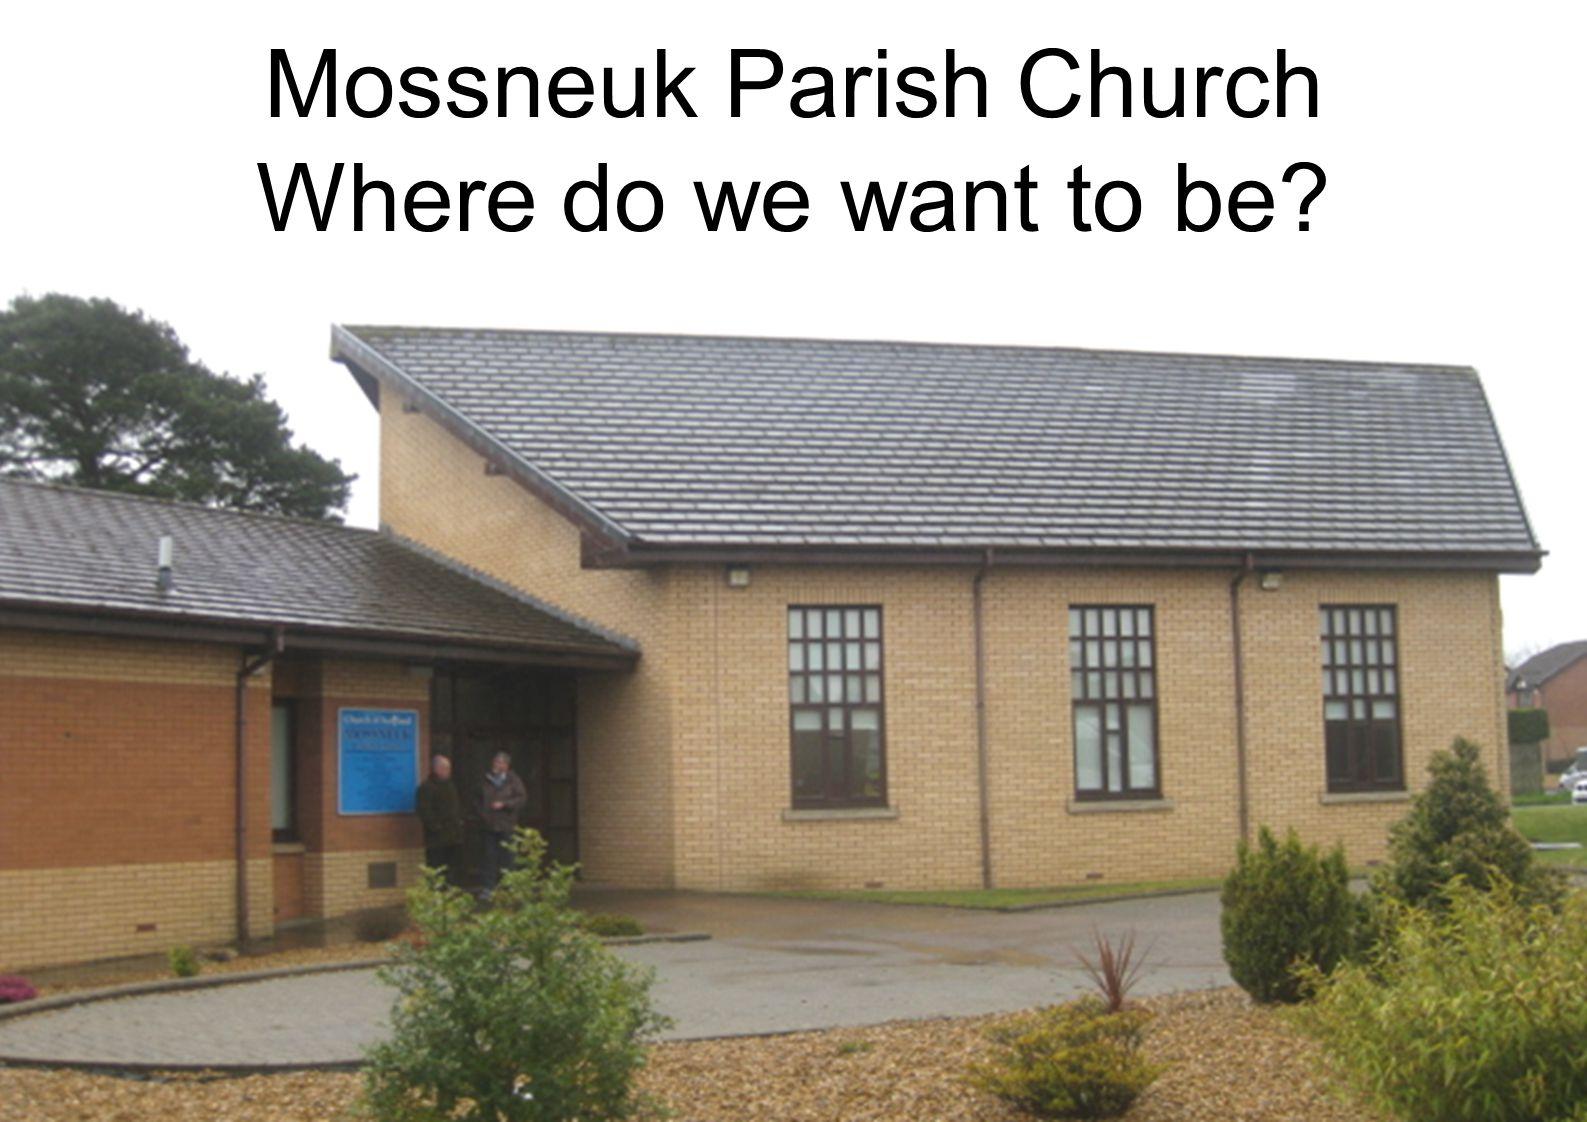 Mossneuk Parish Church The Future